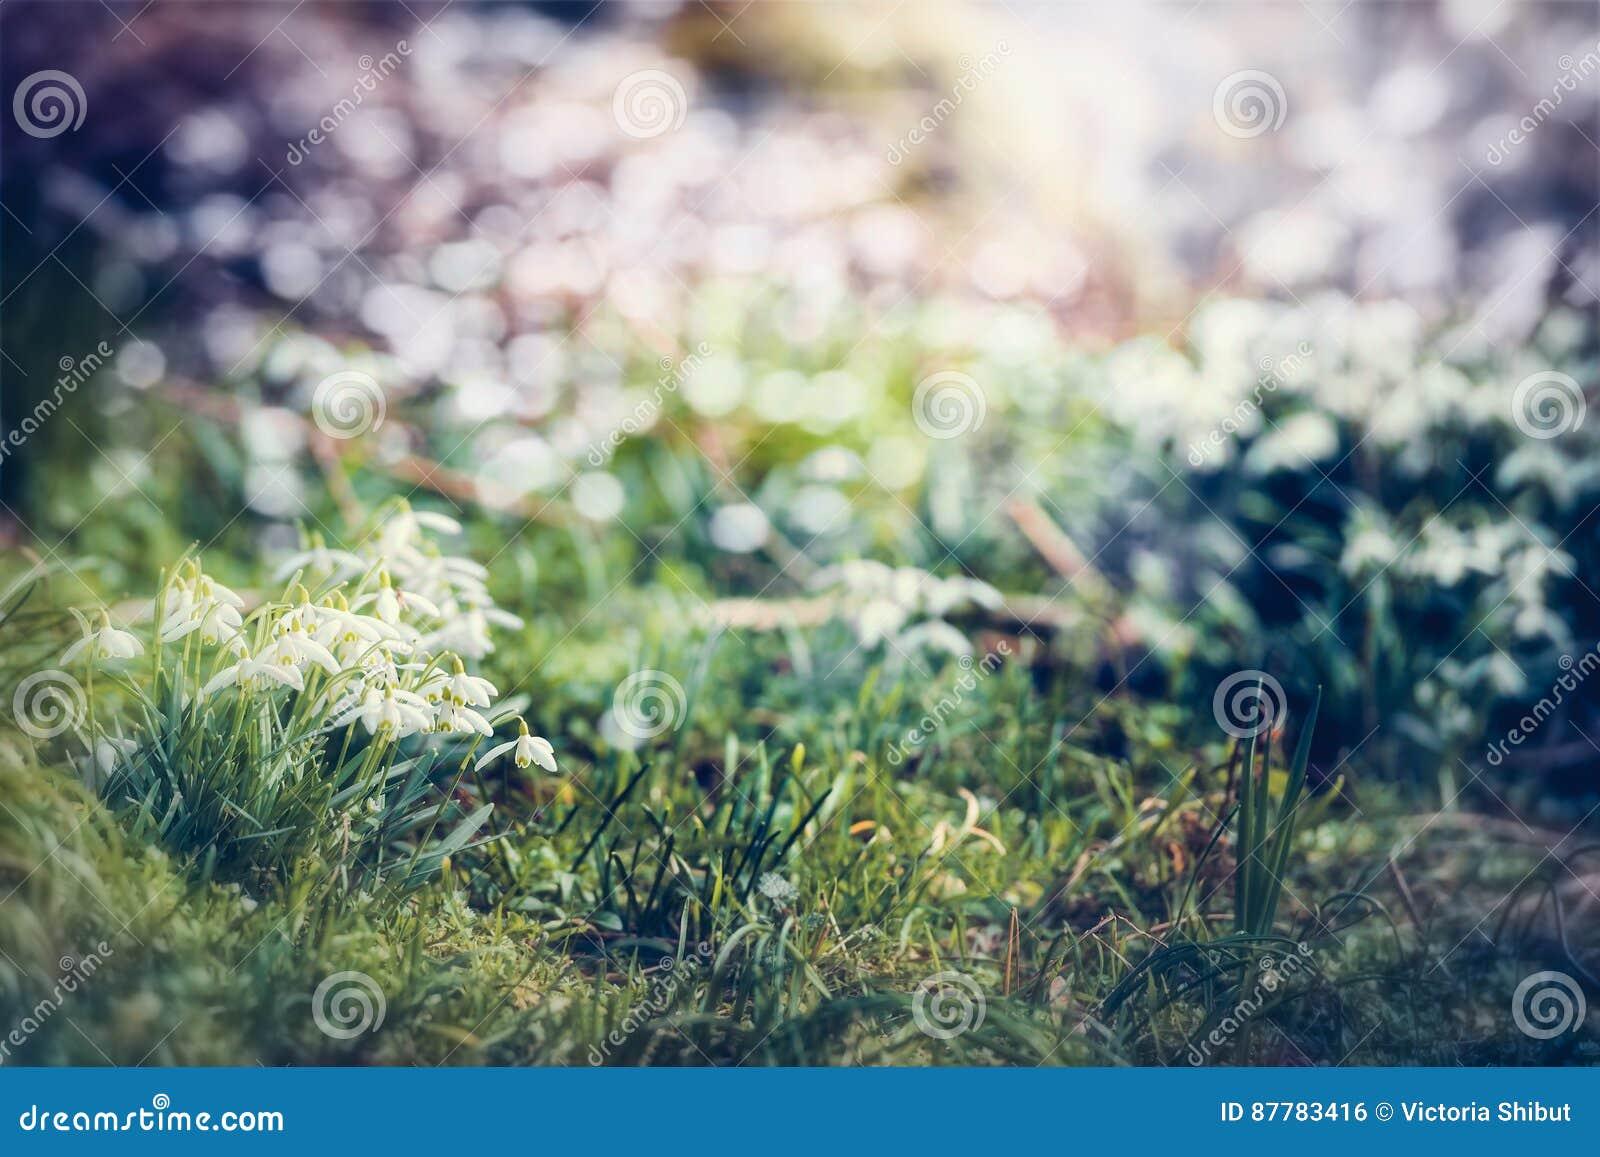 Snowdrops花,室外 与美好的春天自然场面的奇妙春天背景在庭院里